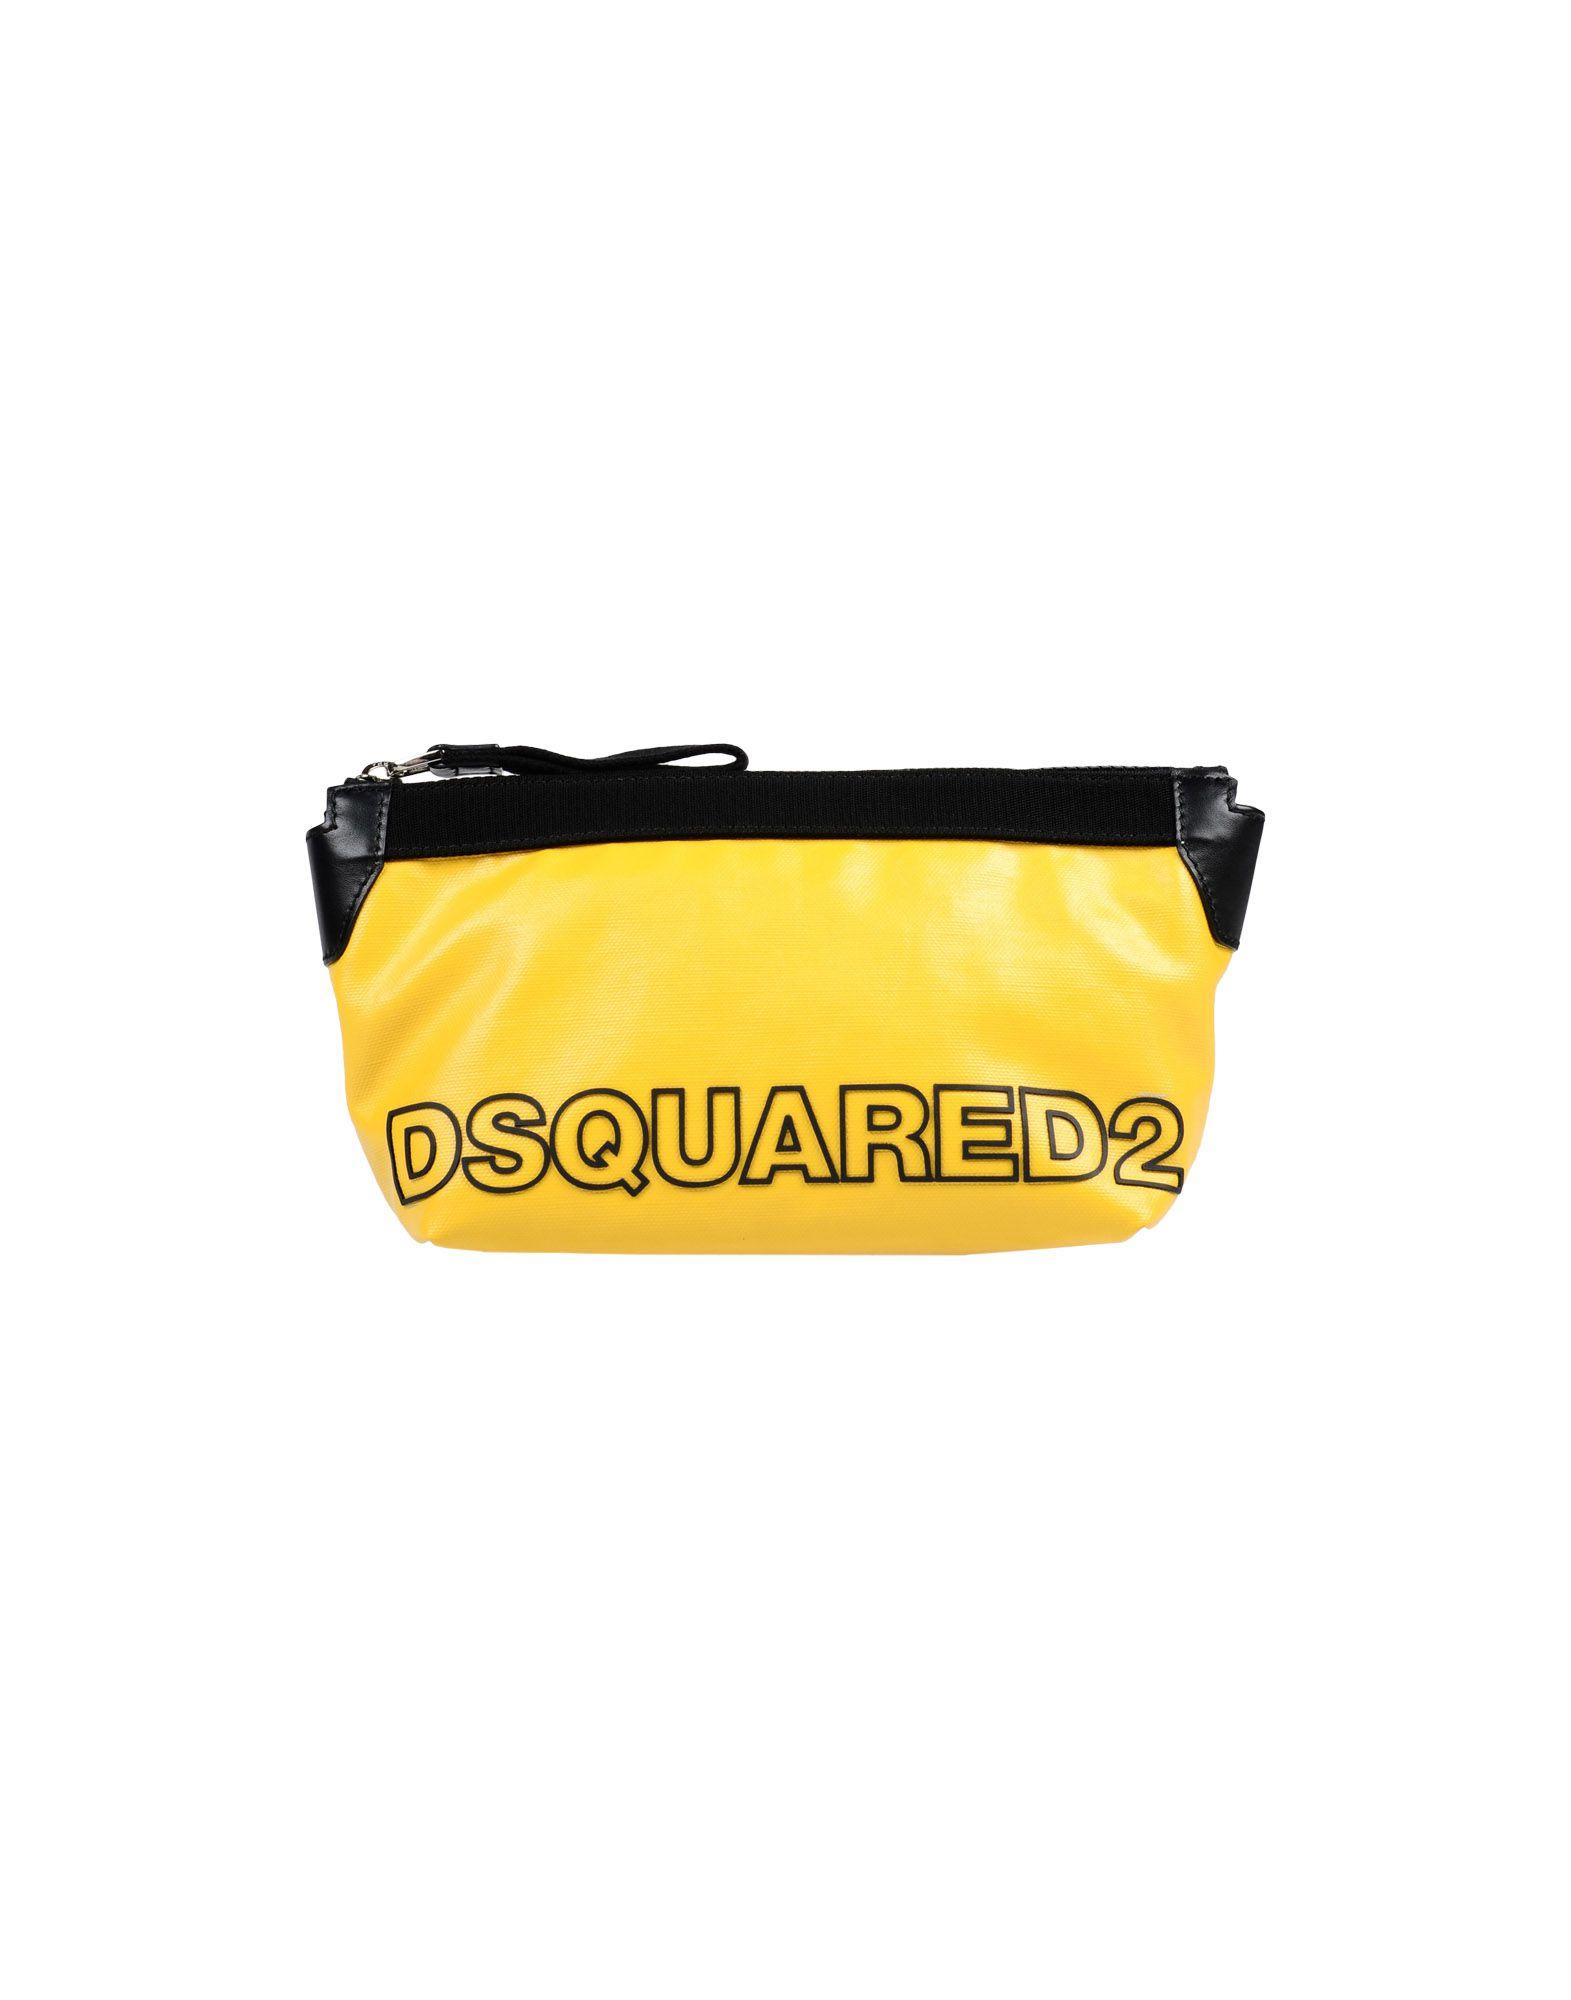 DSQUARED2 Beauty case